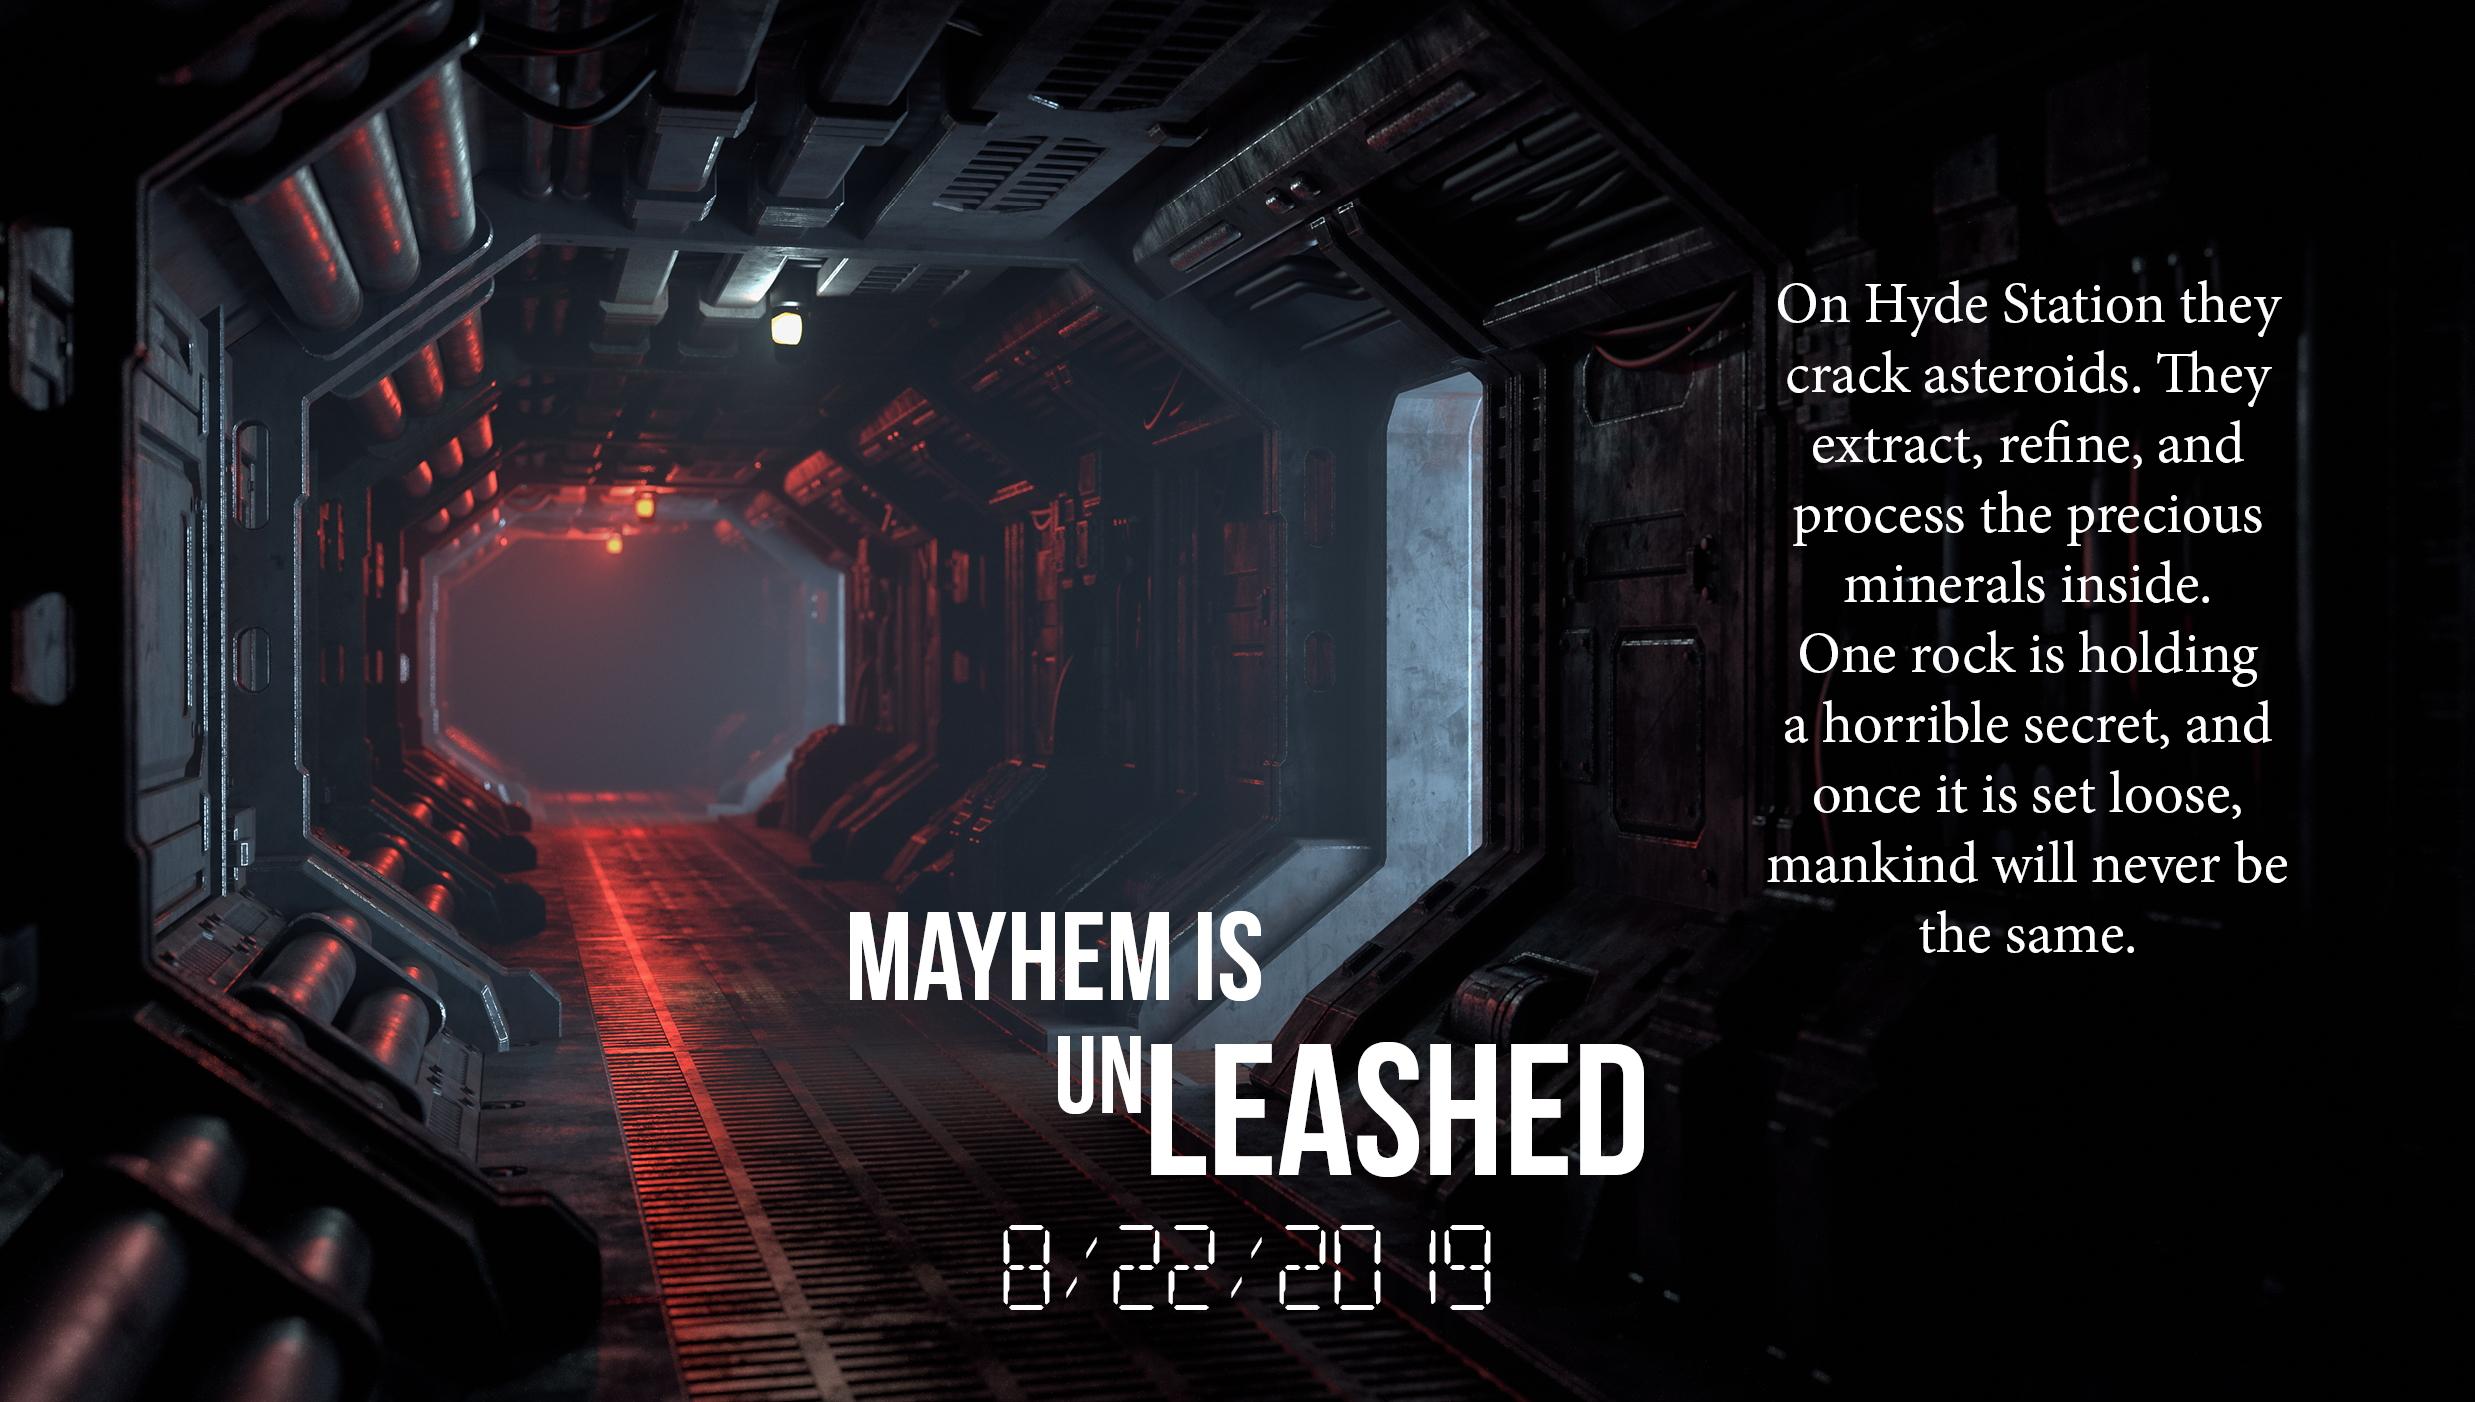 Unleashed ad 1.jpg